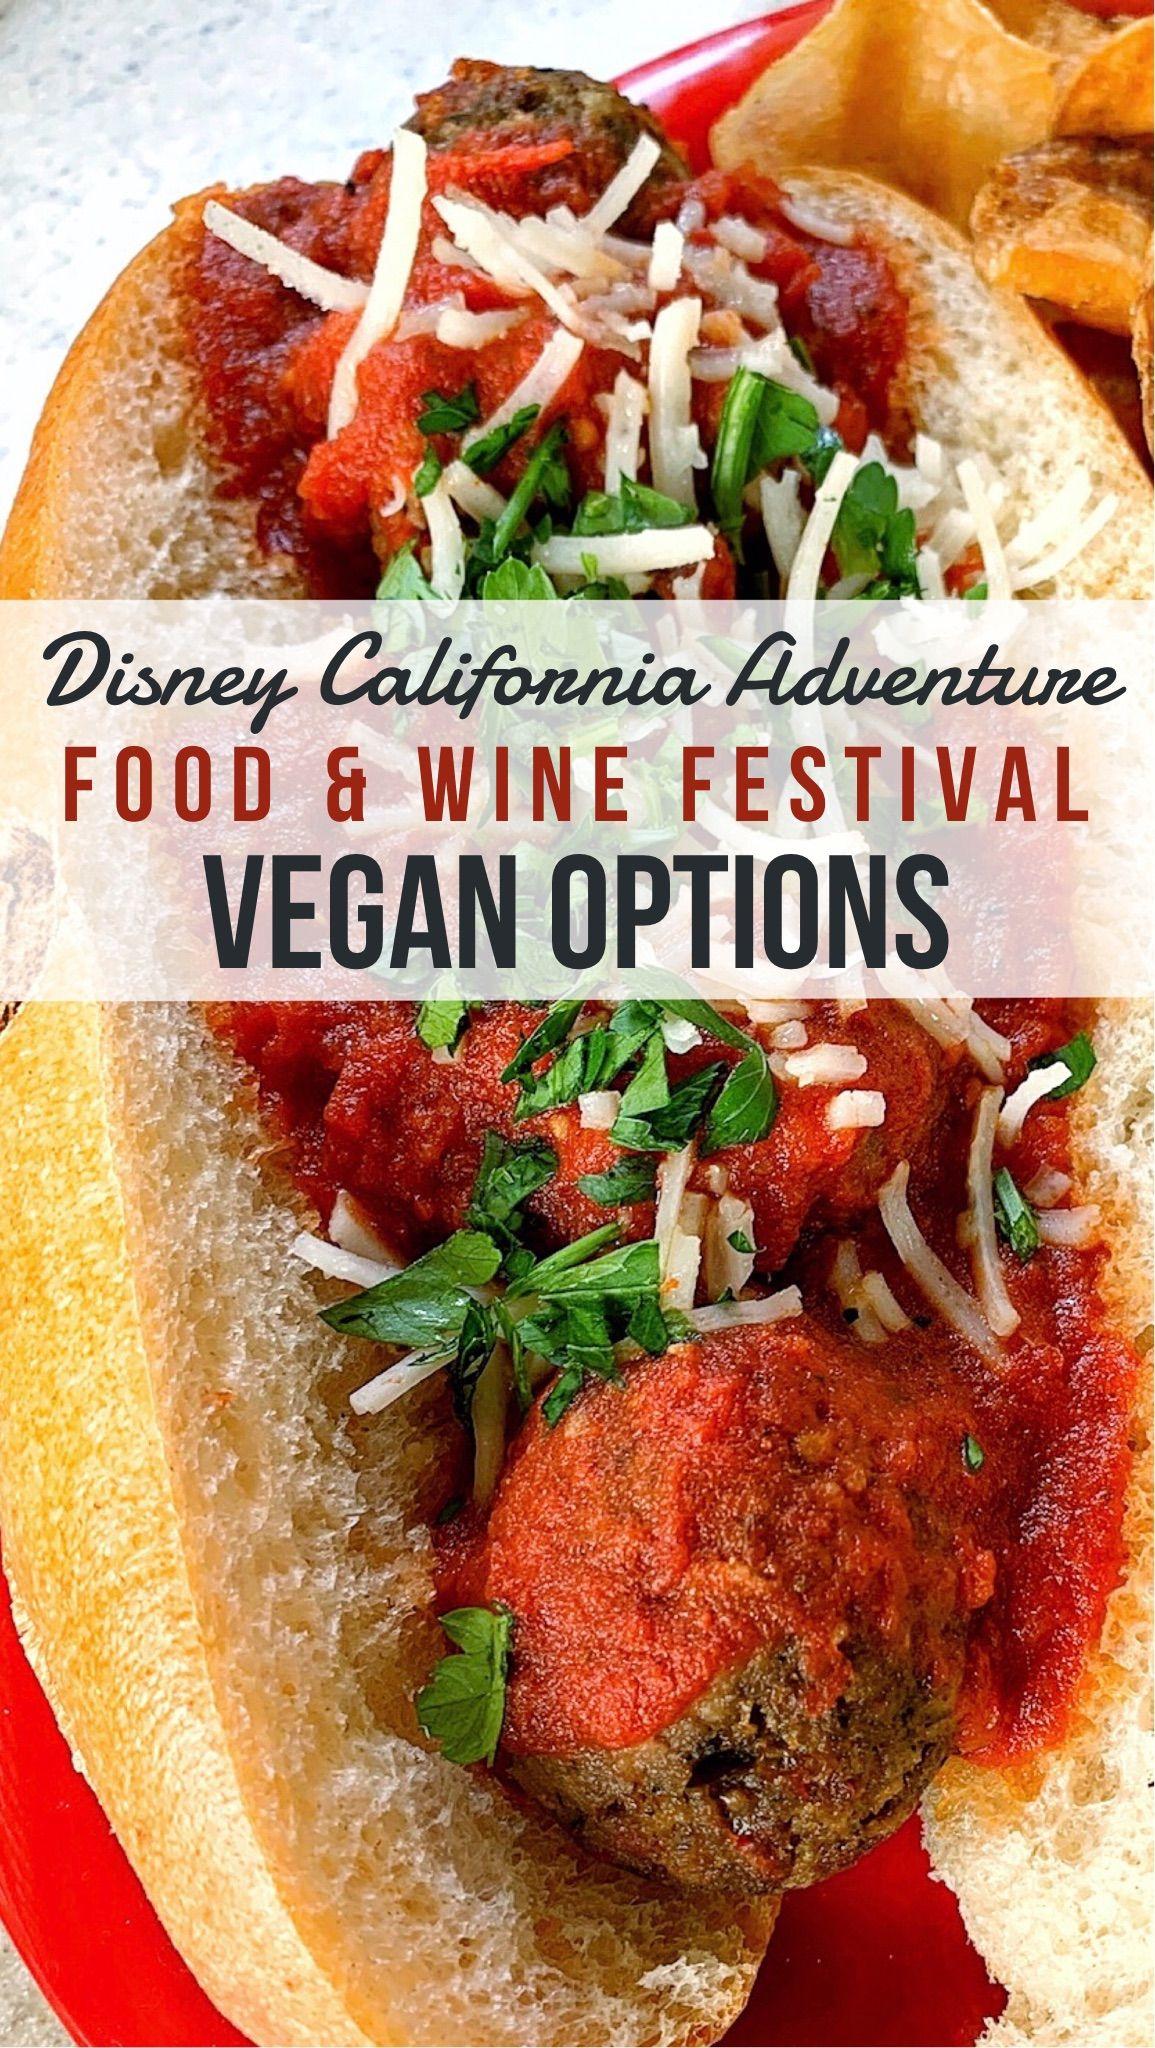 Vegan At The Disney California Adventure Food And Wine Festival In 2020 Wine Recipes Full Meal Recipes Wine Festival